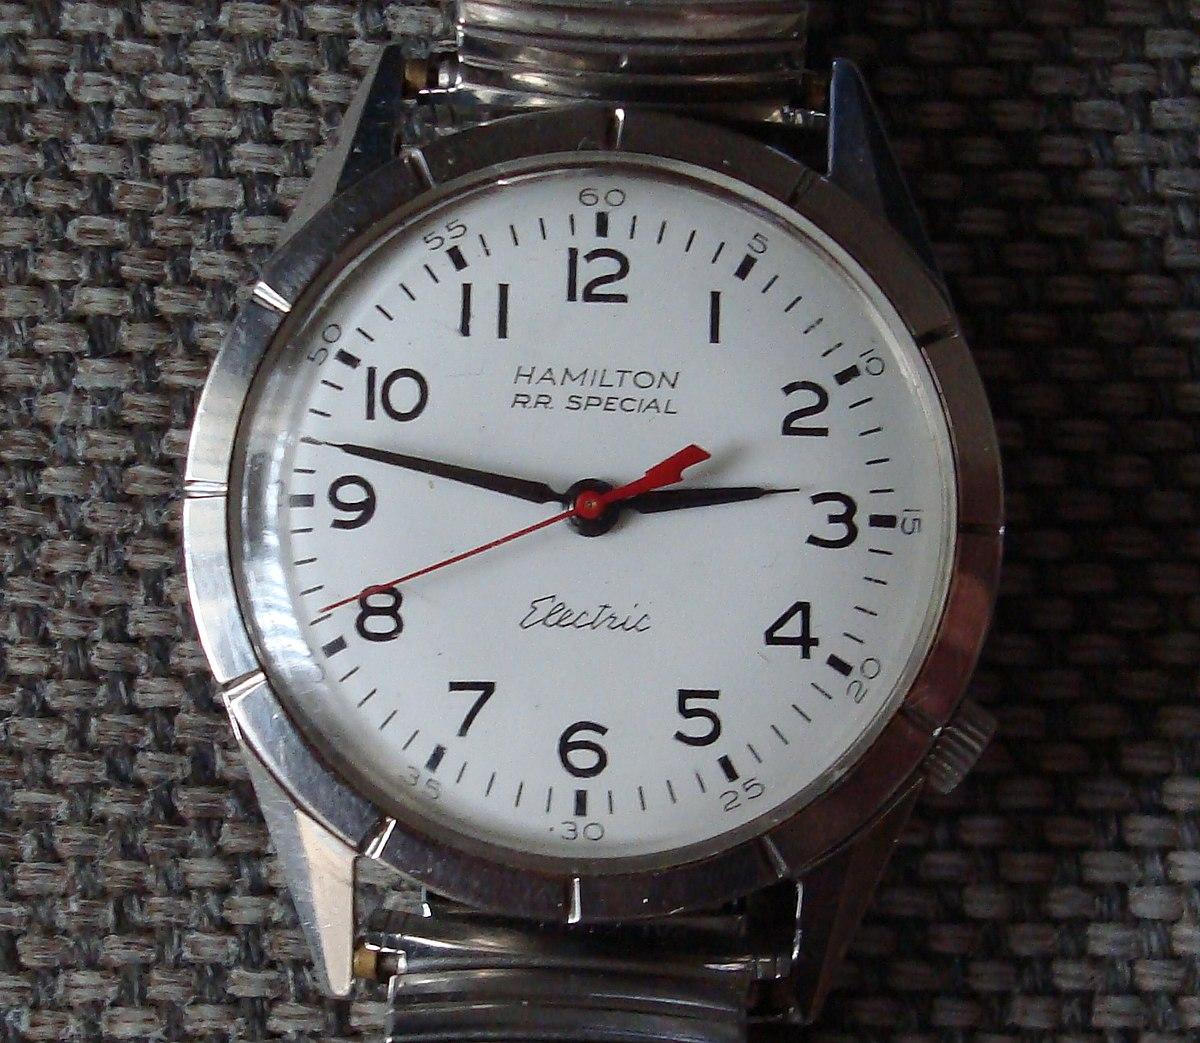 electric watch wikipedia